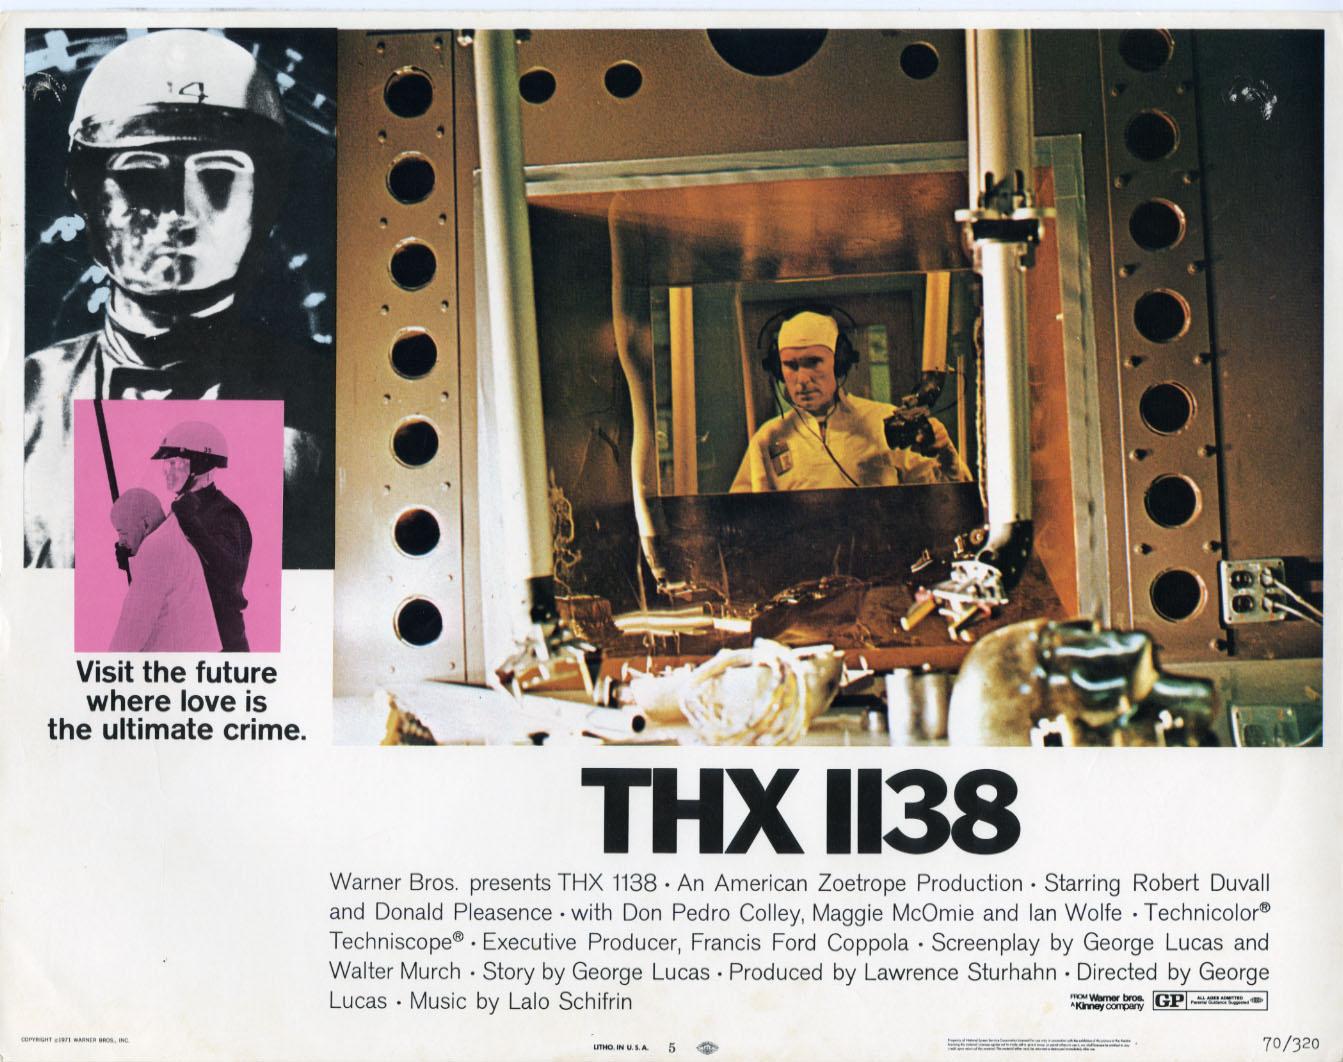 22718 2 THX 1138 THX 1138 Photography lobby cards design